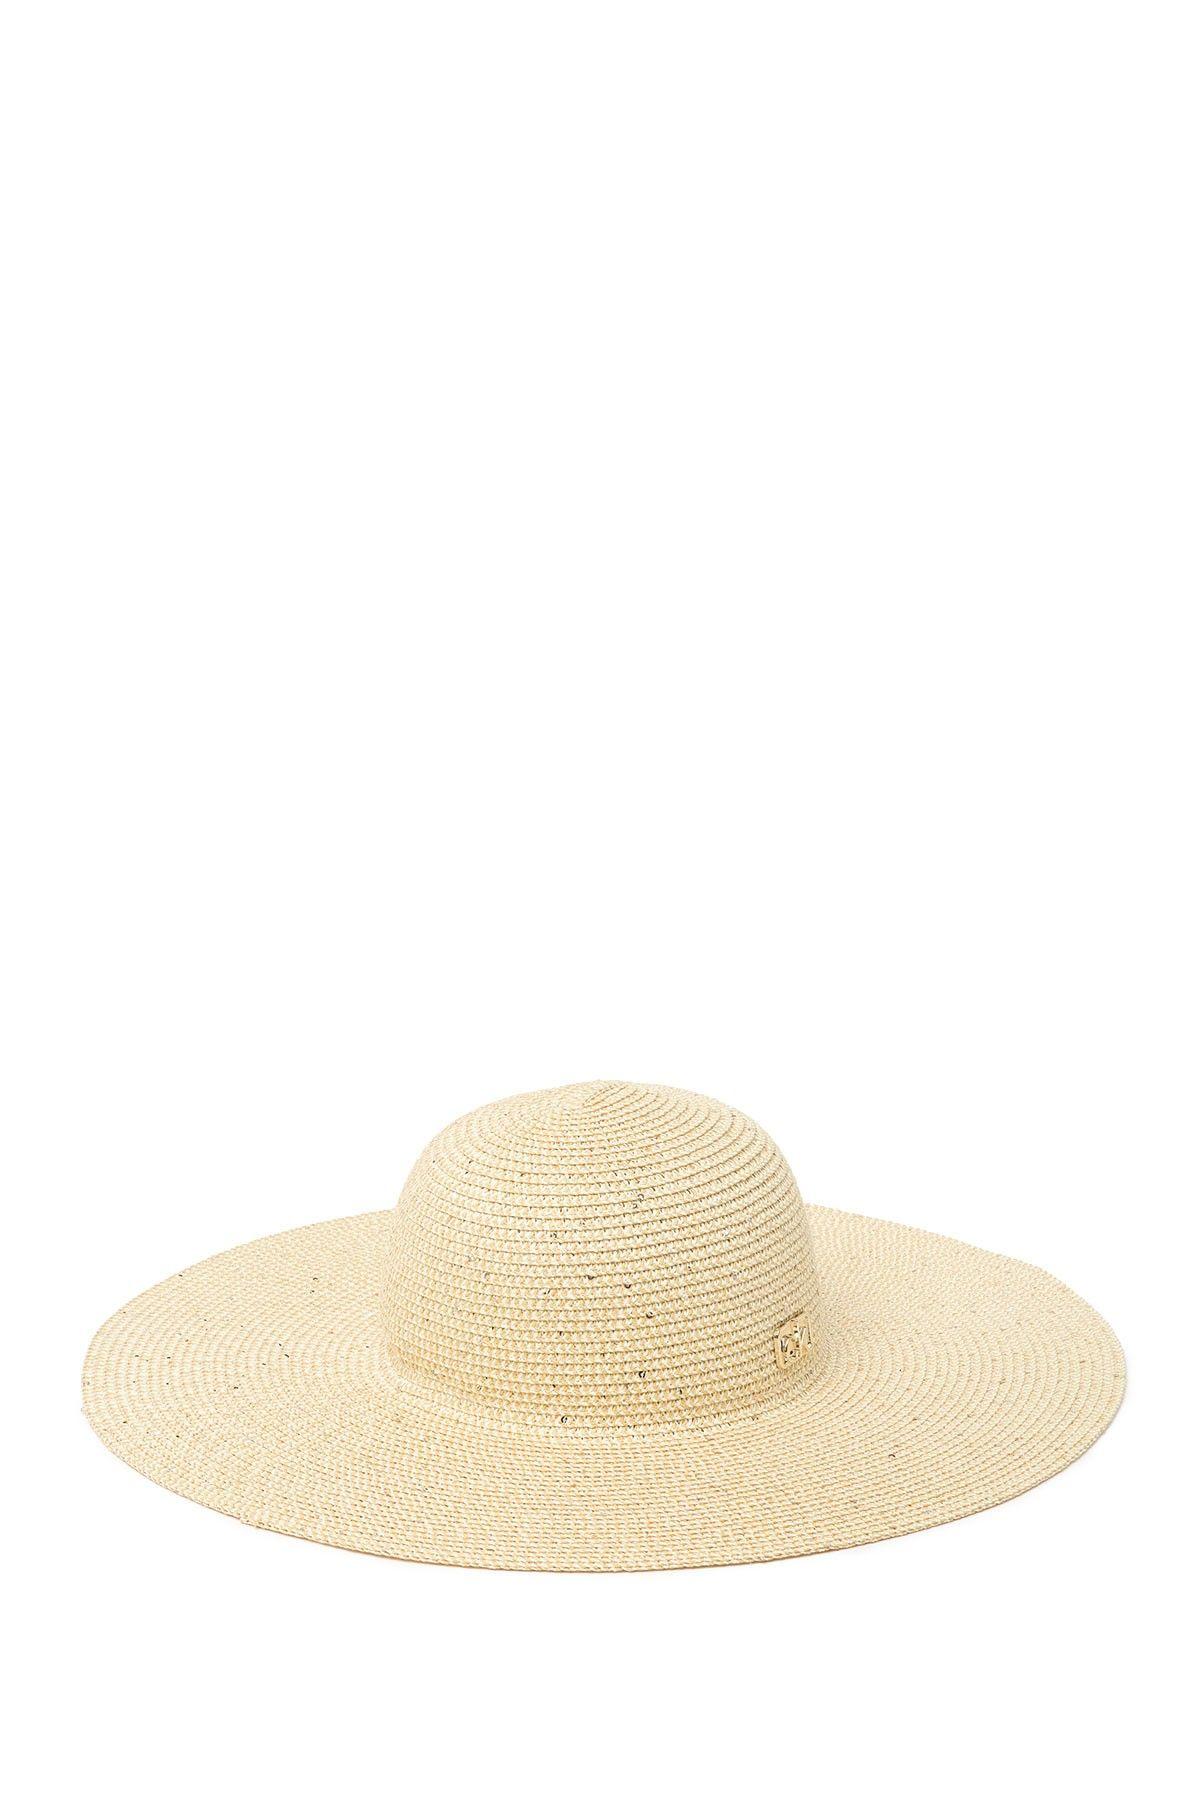 Calvin Klein | Sparkle Sun Hat | Nordstrom Rack